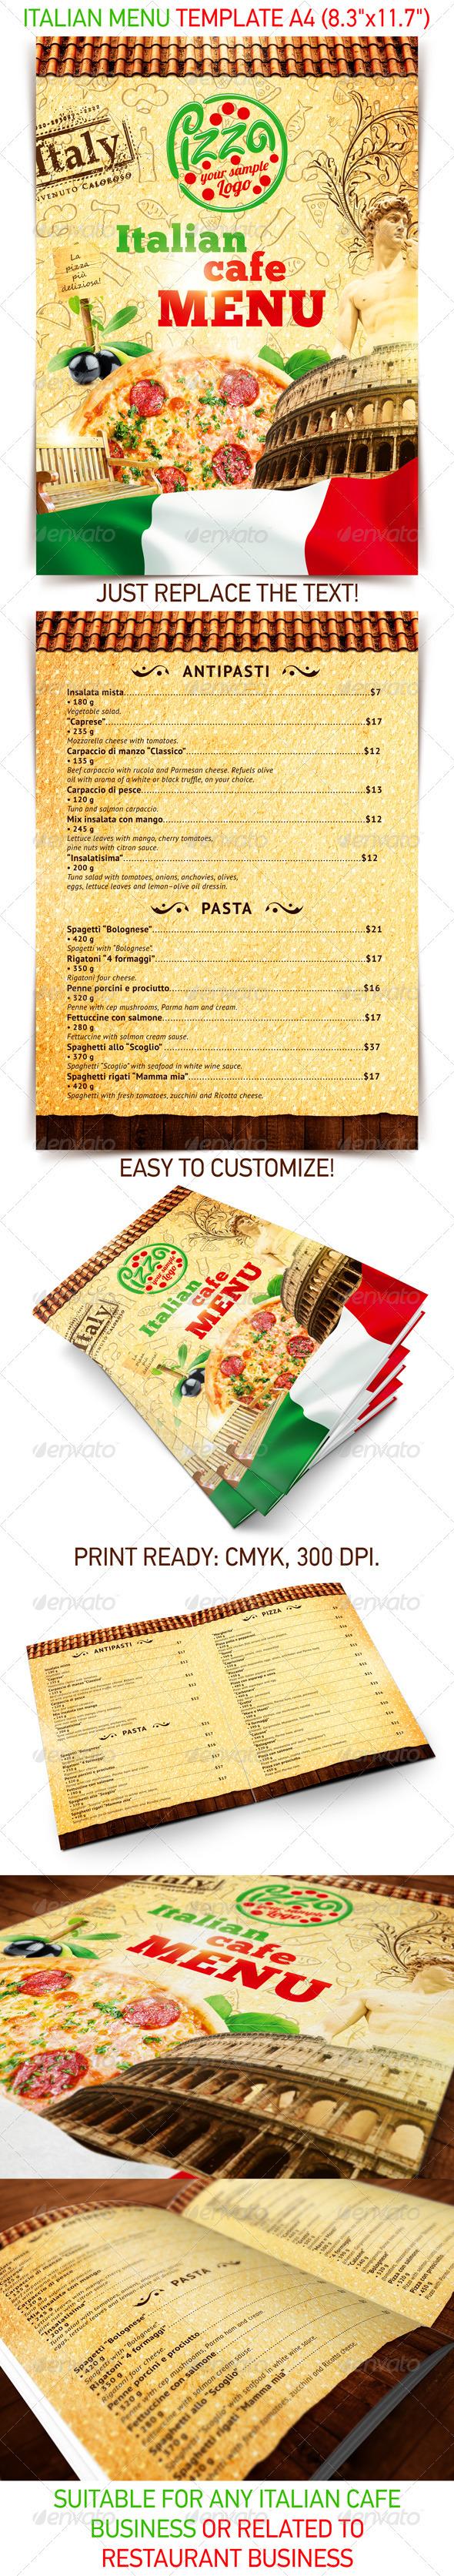 restaurant menu example military bralicious co